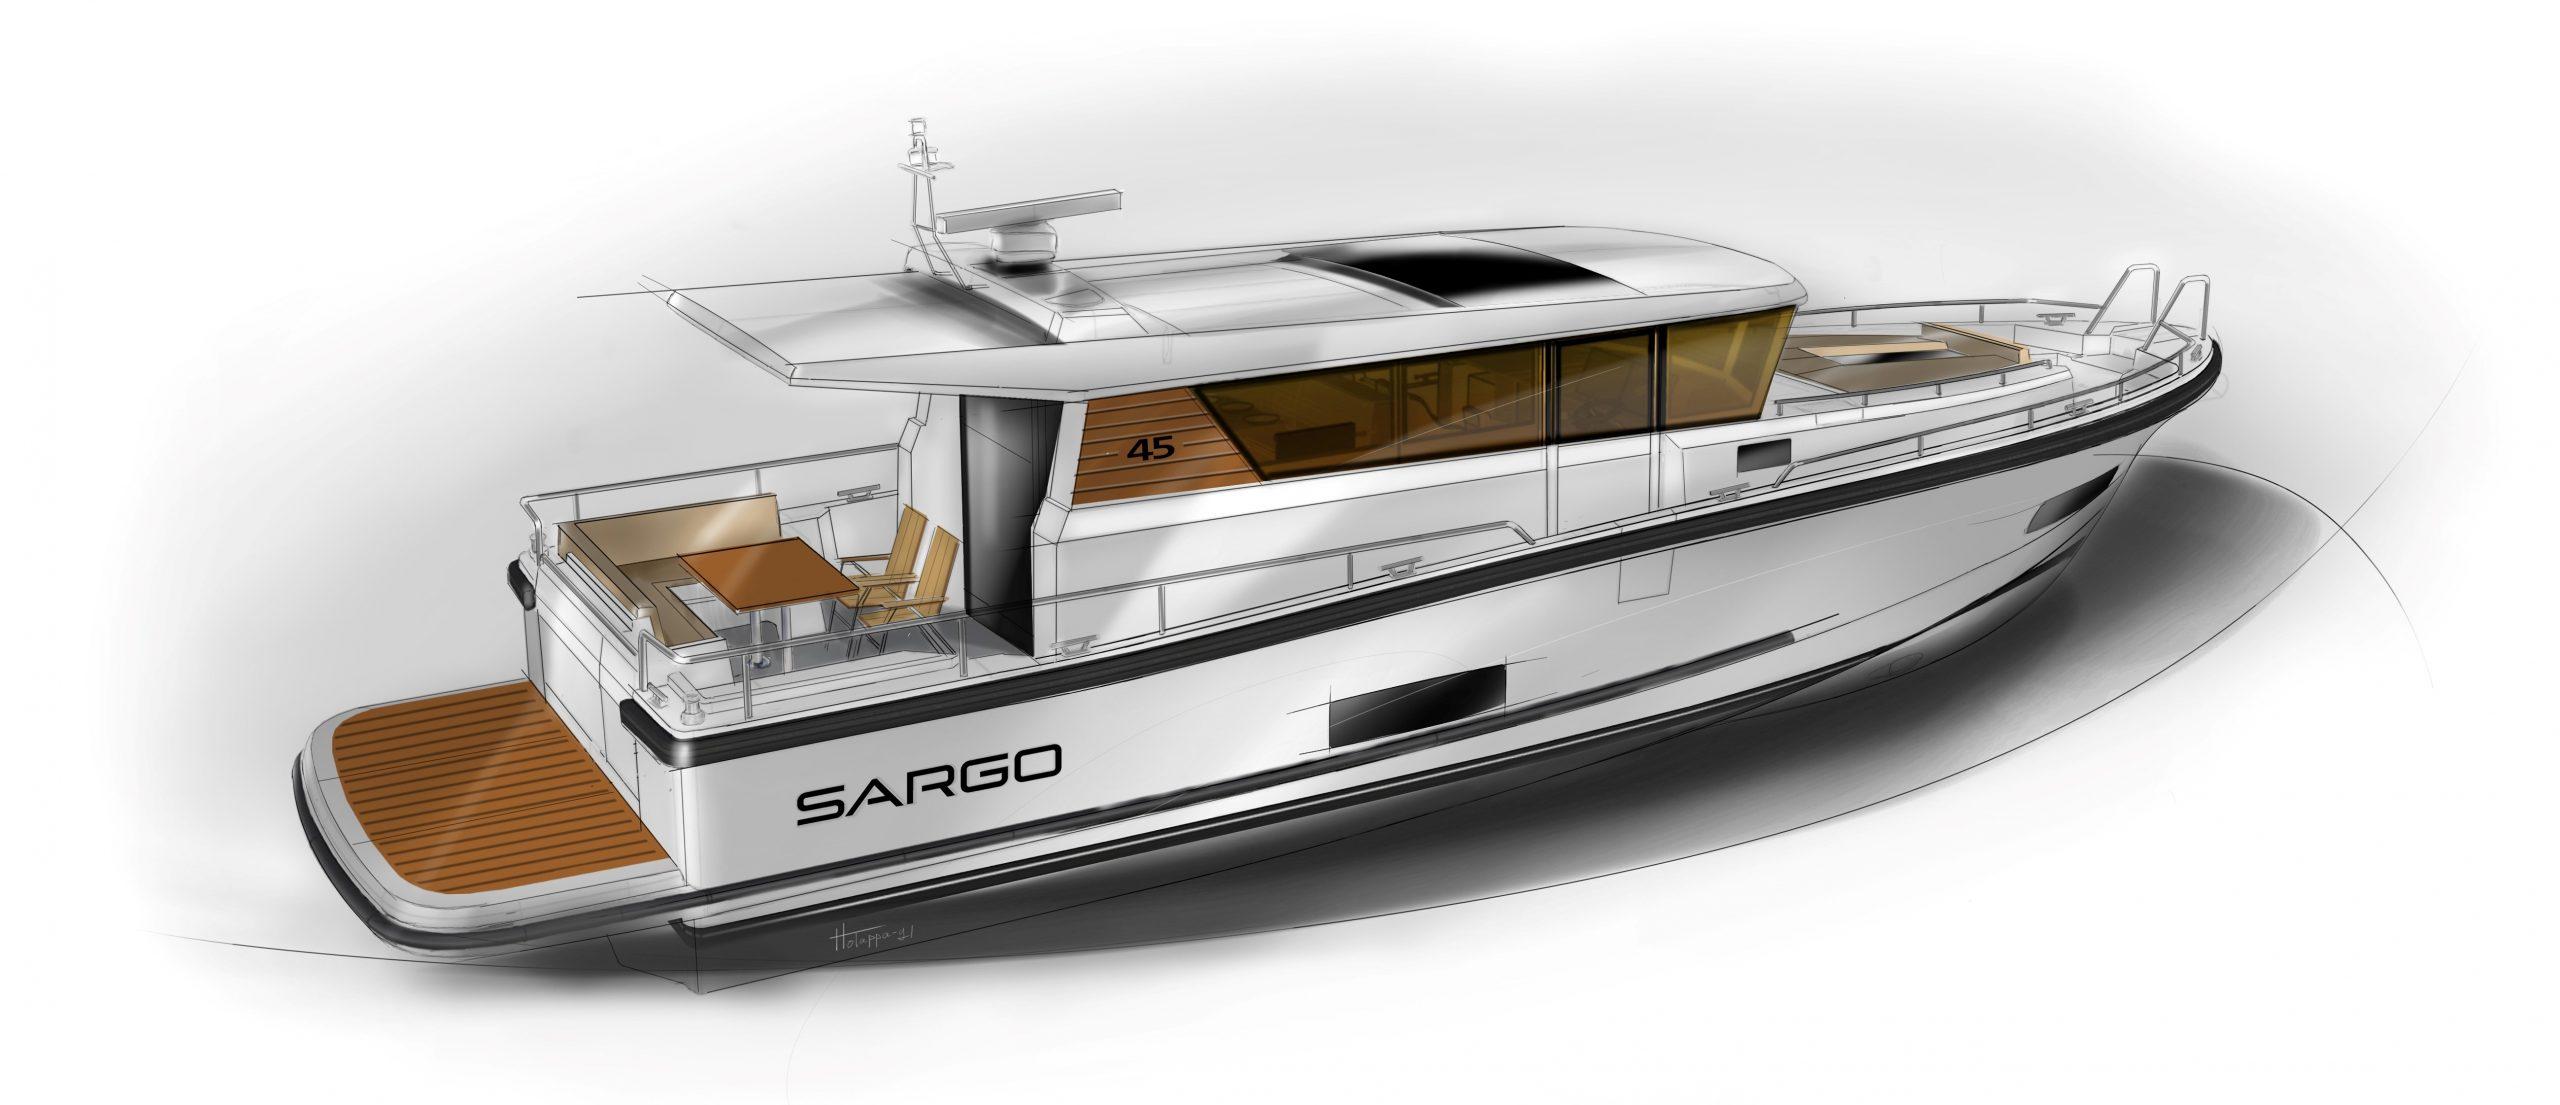 sargo 45 1 scaled 2